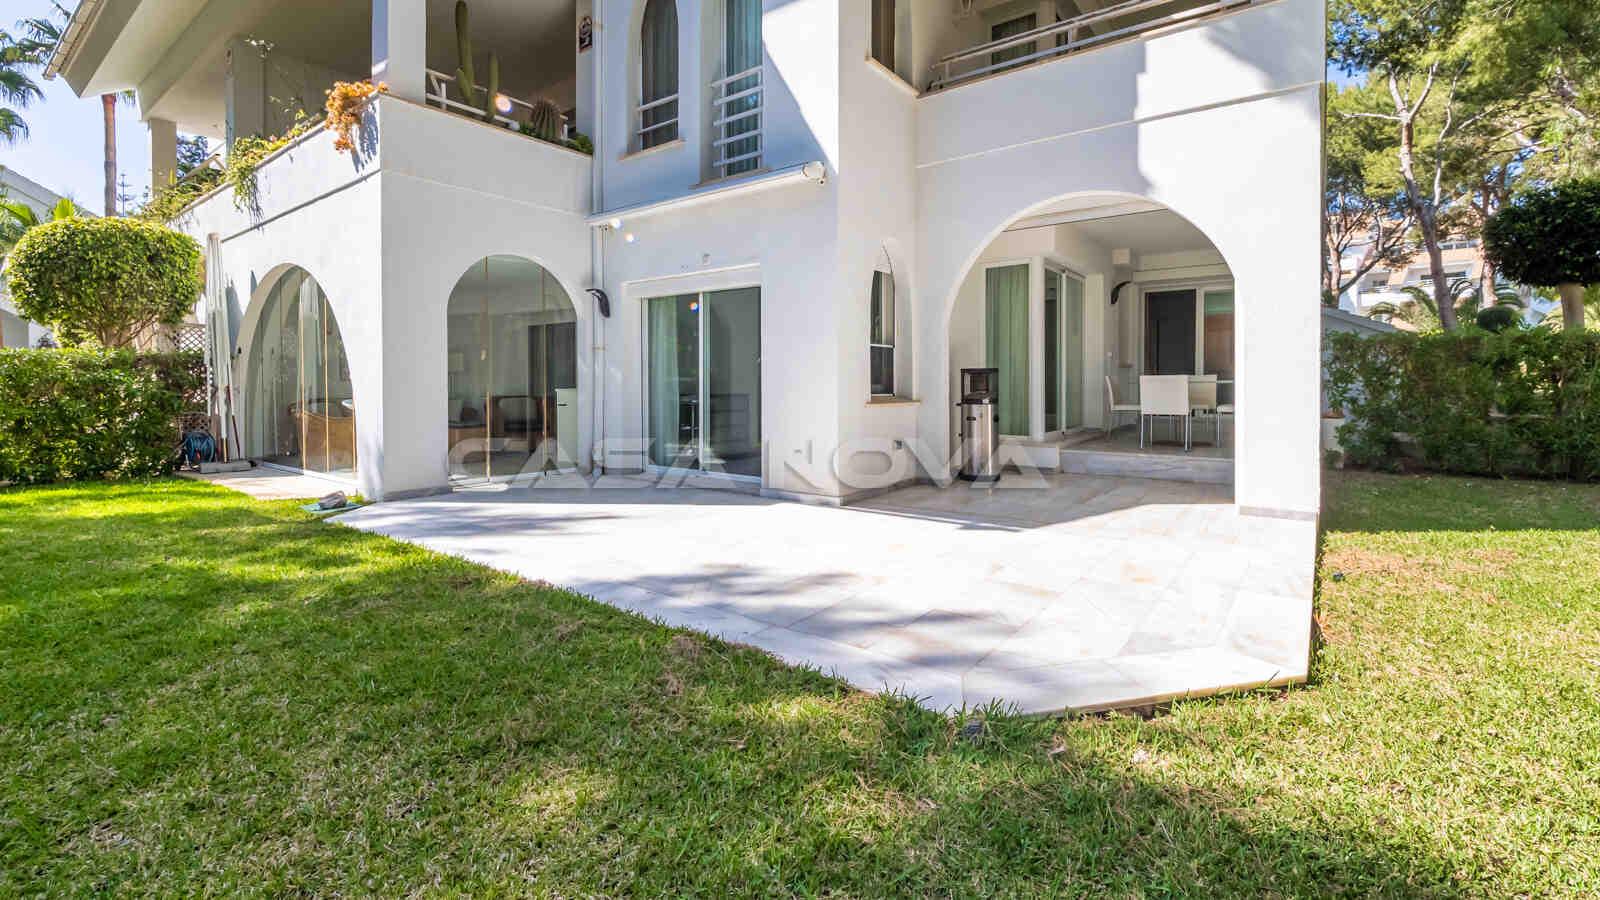 Top Mallorca Apartment in beliebter Wohnresidenz